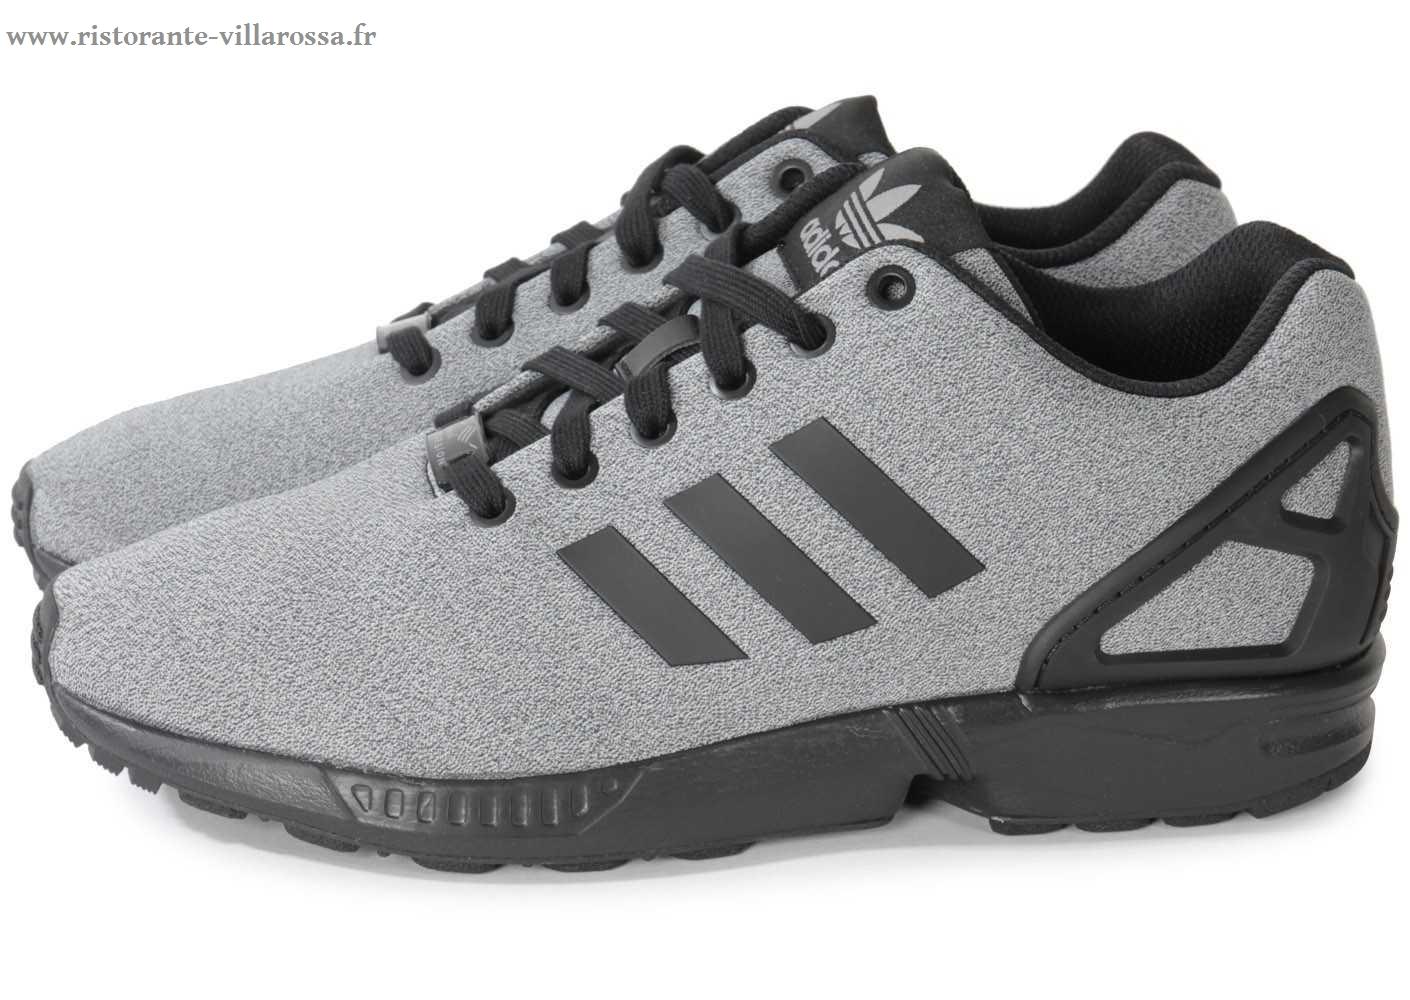 adidas zx flux homme cdiscount